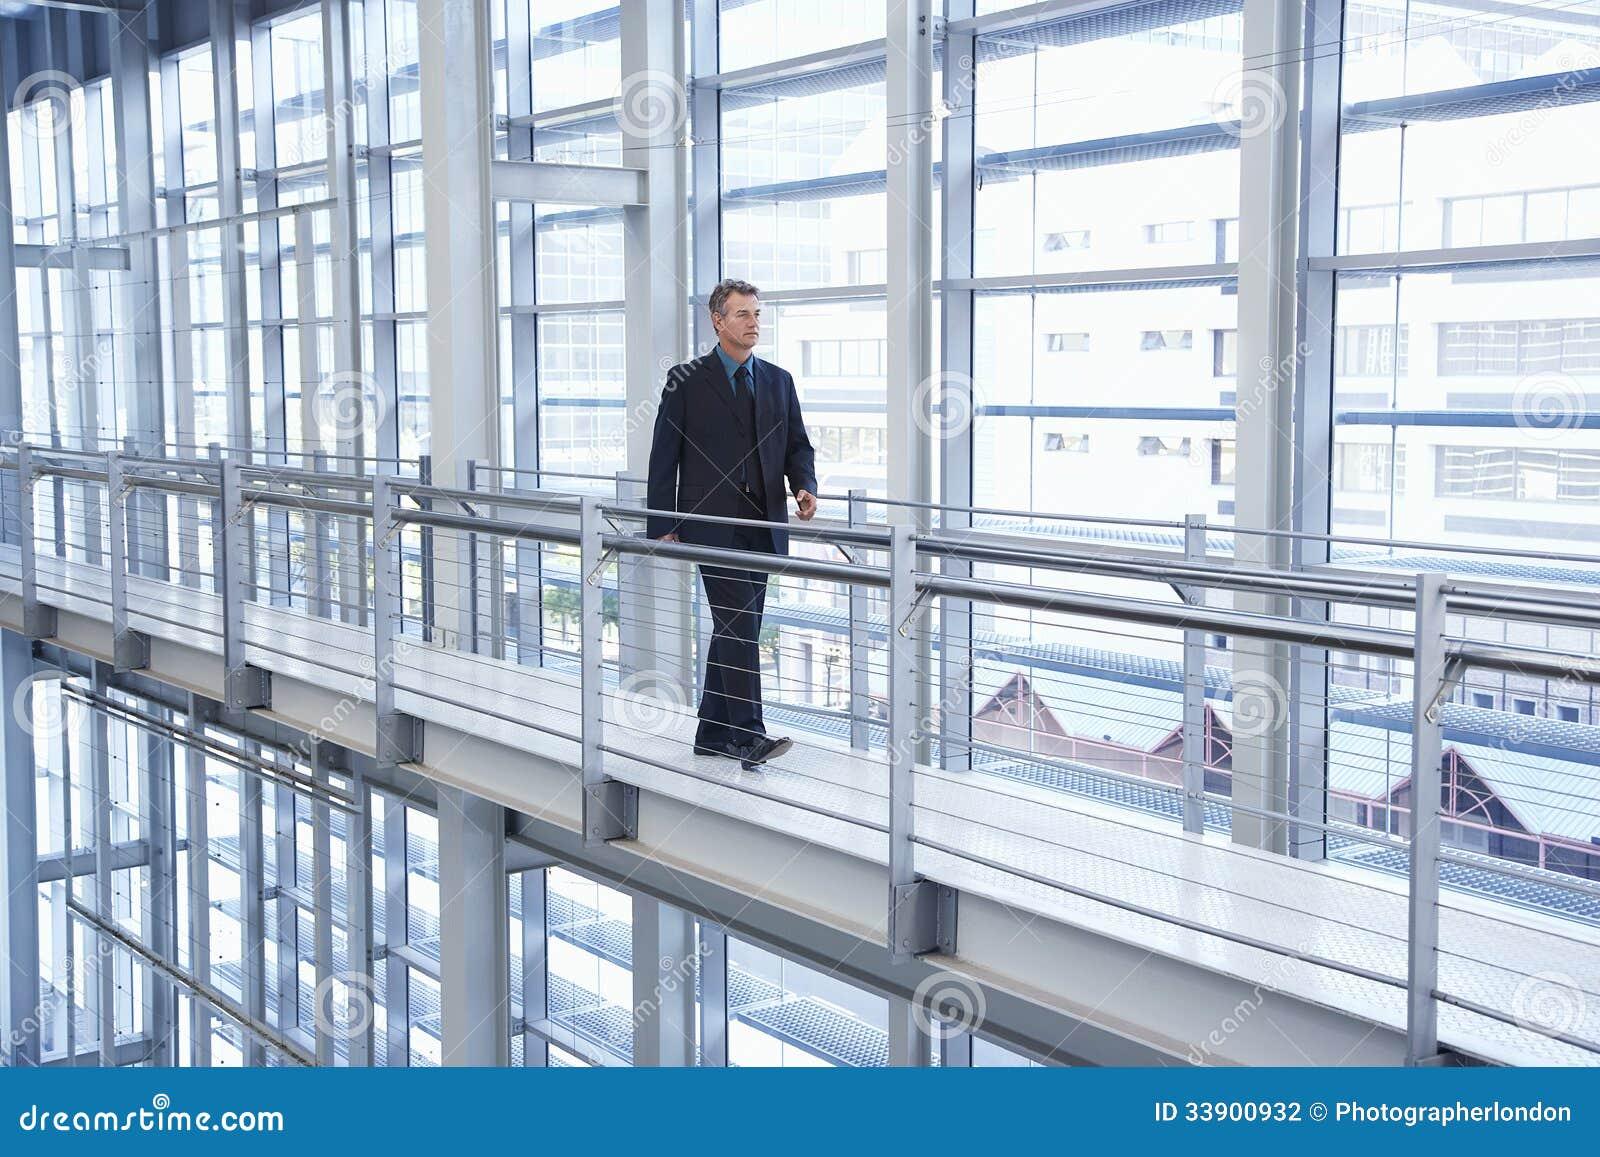 Hombre de negocios Walking By Railing en oficina moderna